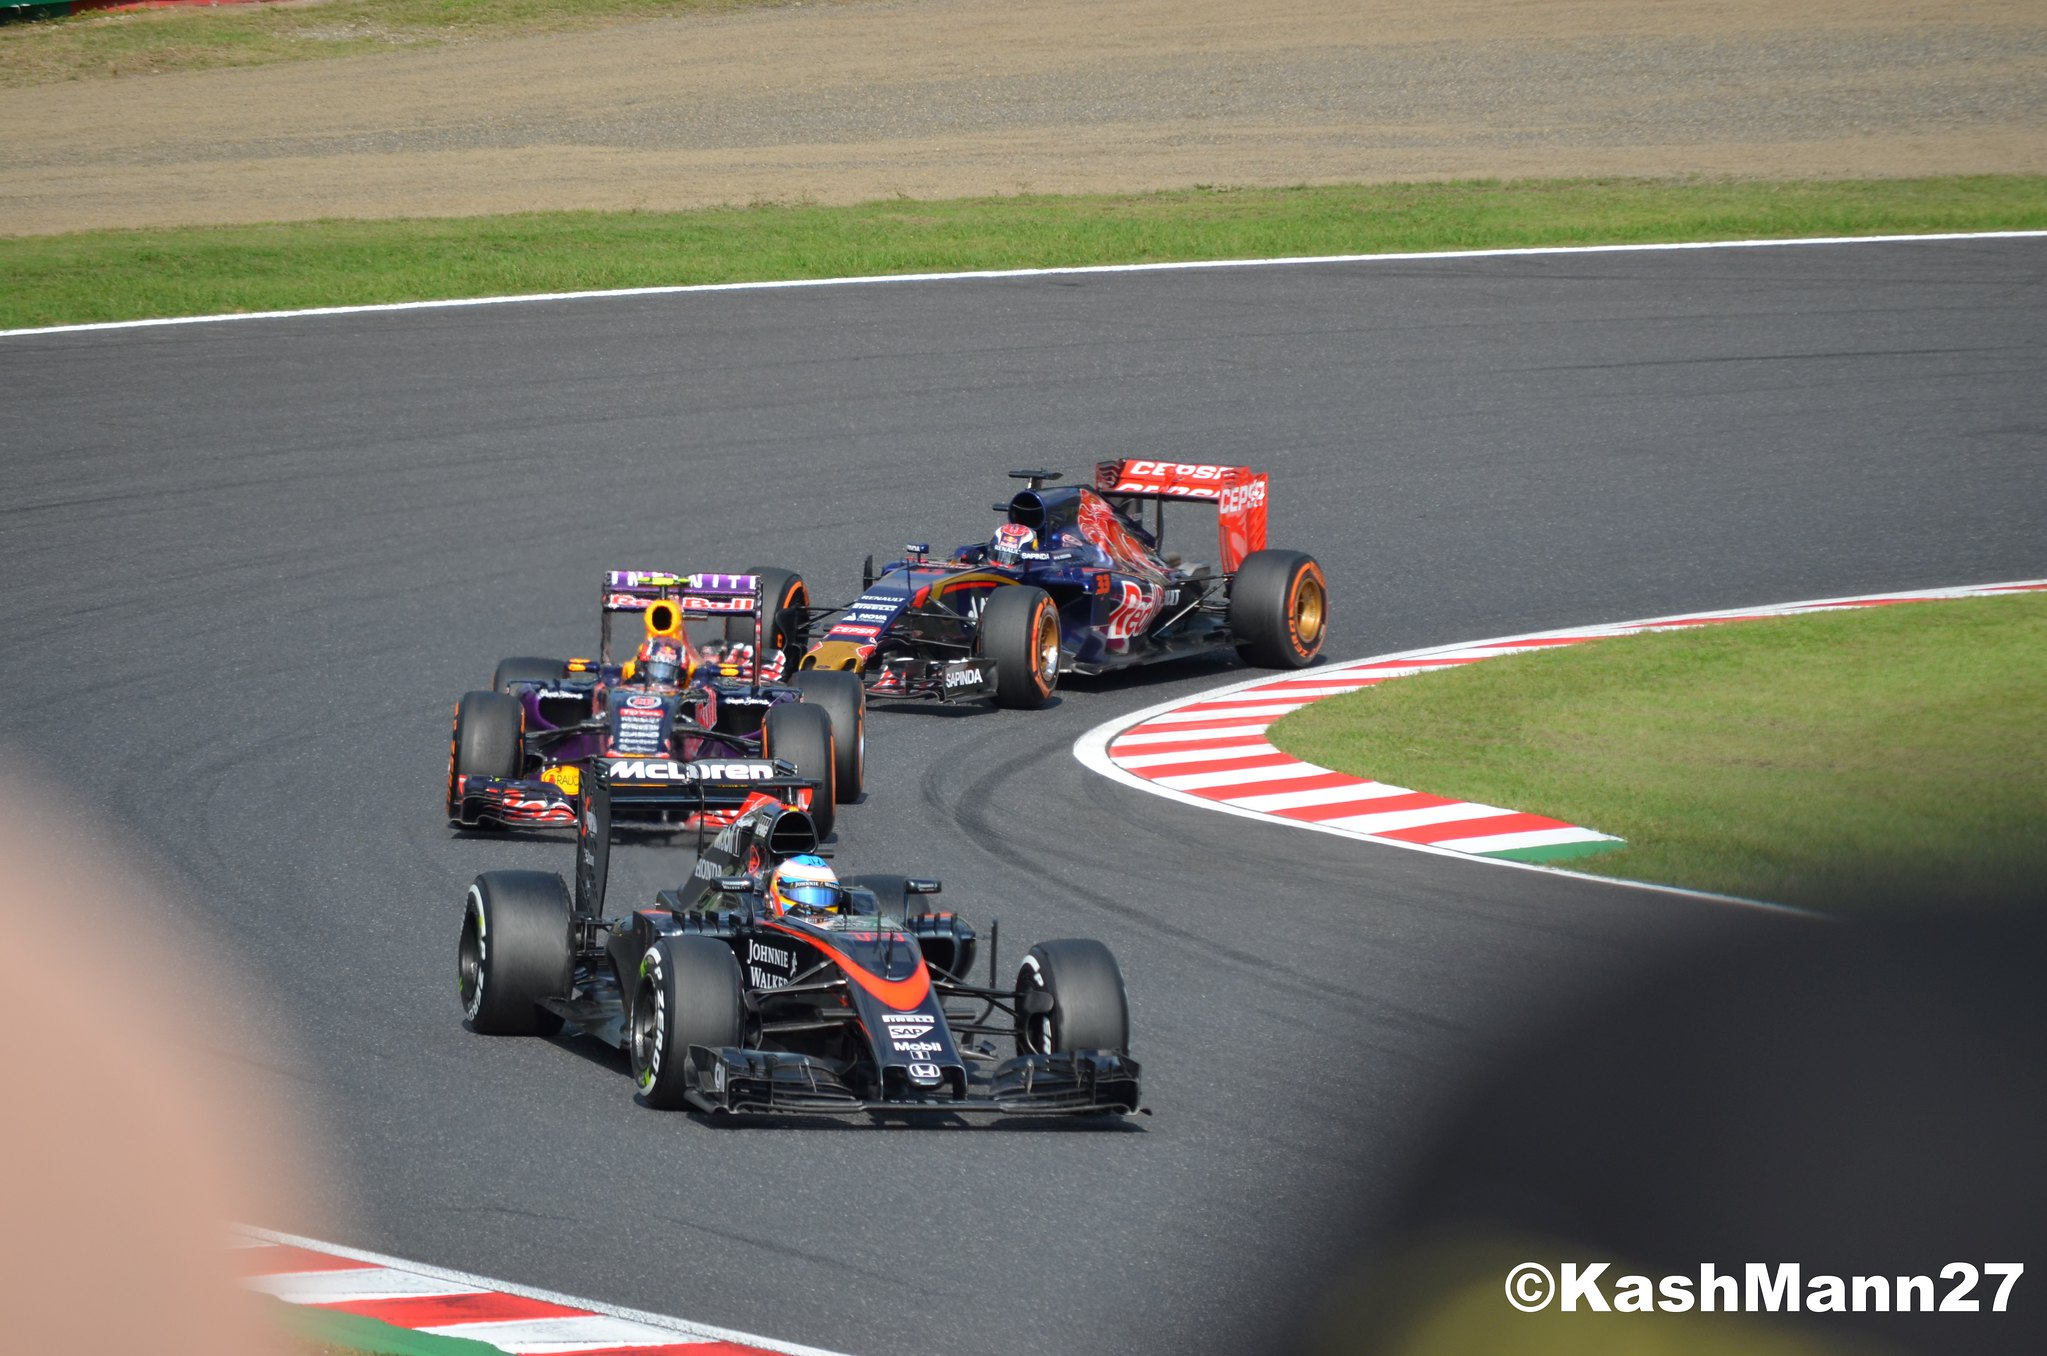 Alonso vs Kvyat vs Verstappen